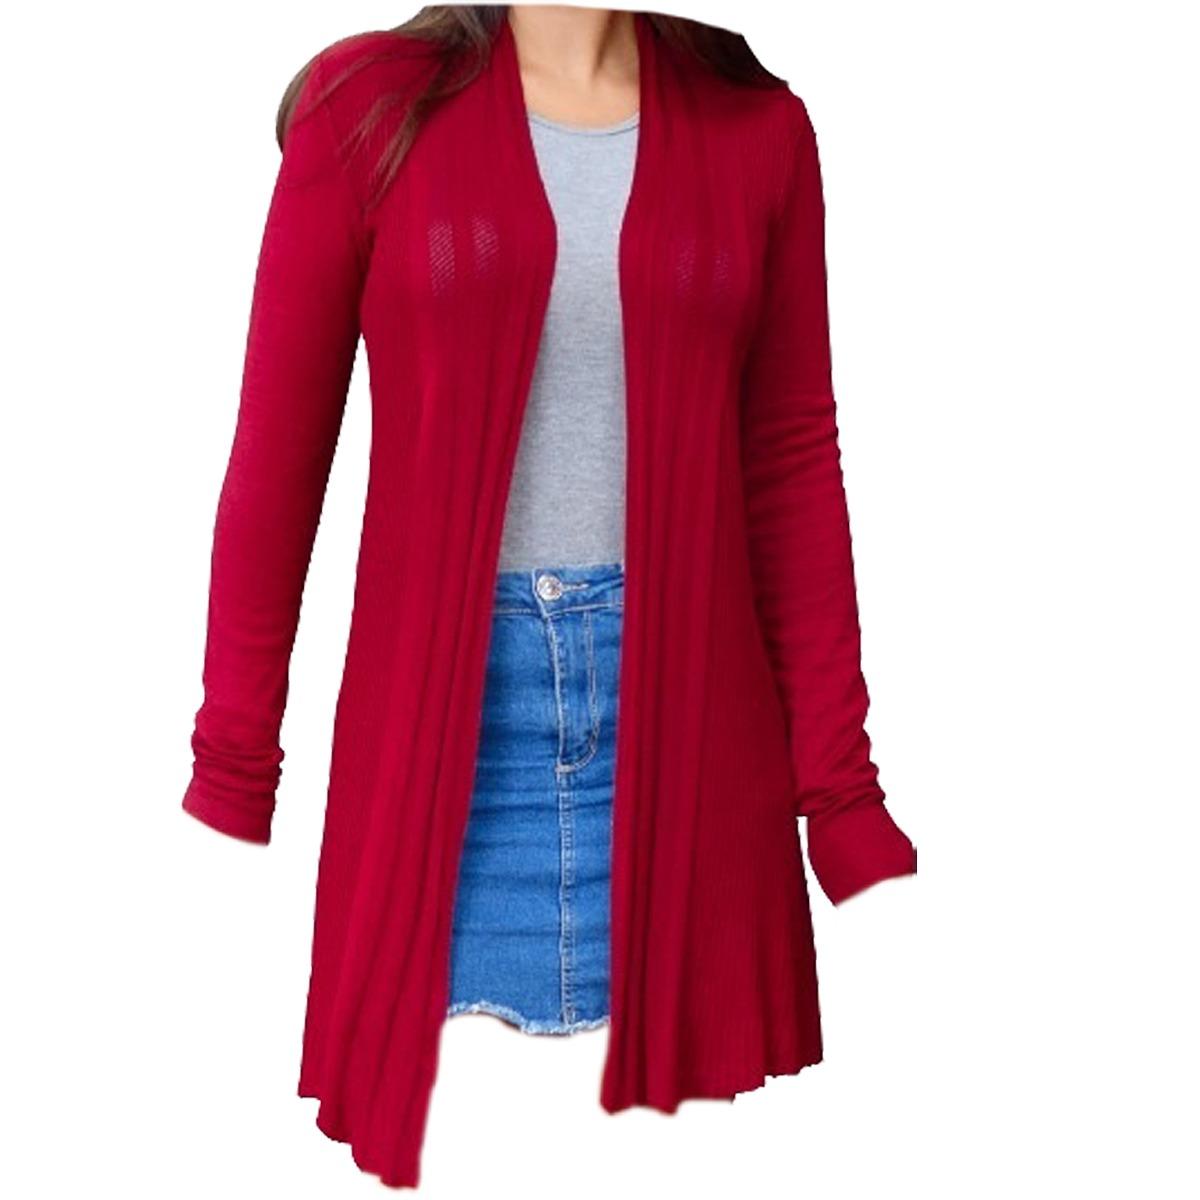 59489883e Blusa-de-frio-feminina-casaco-cardigan-sueter-la-tricot - R$ 42,32 ...